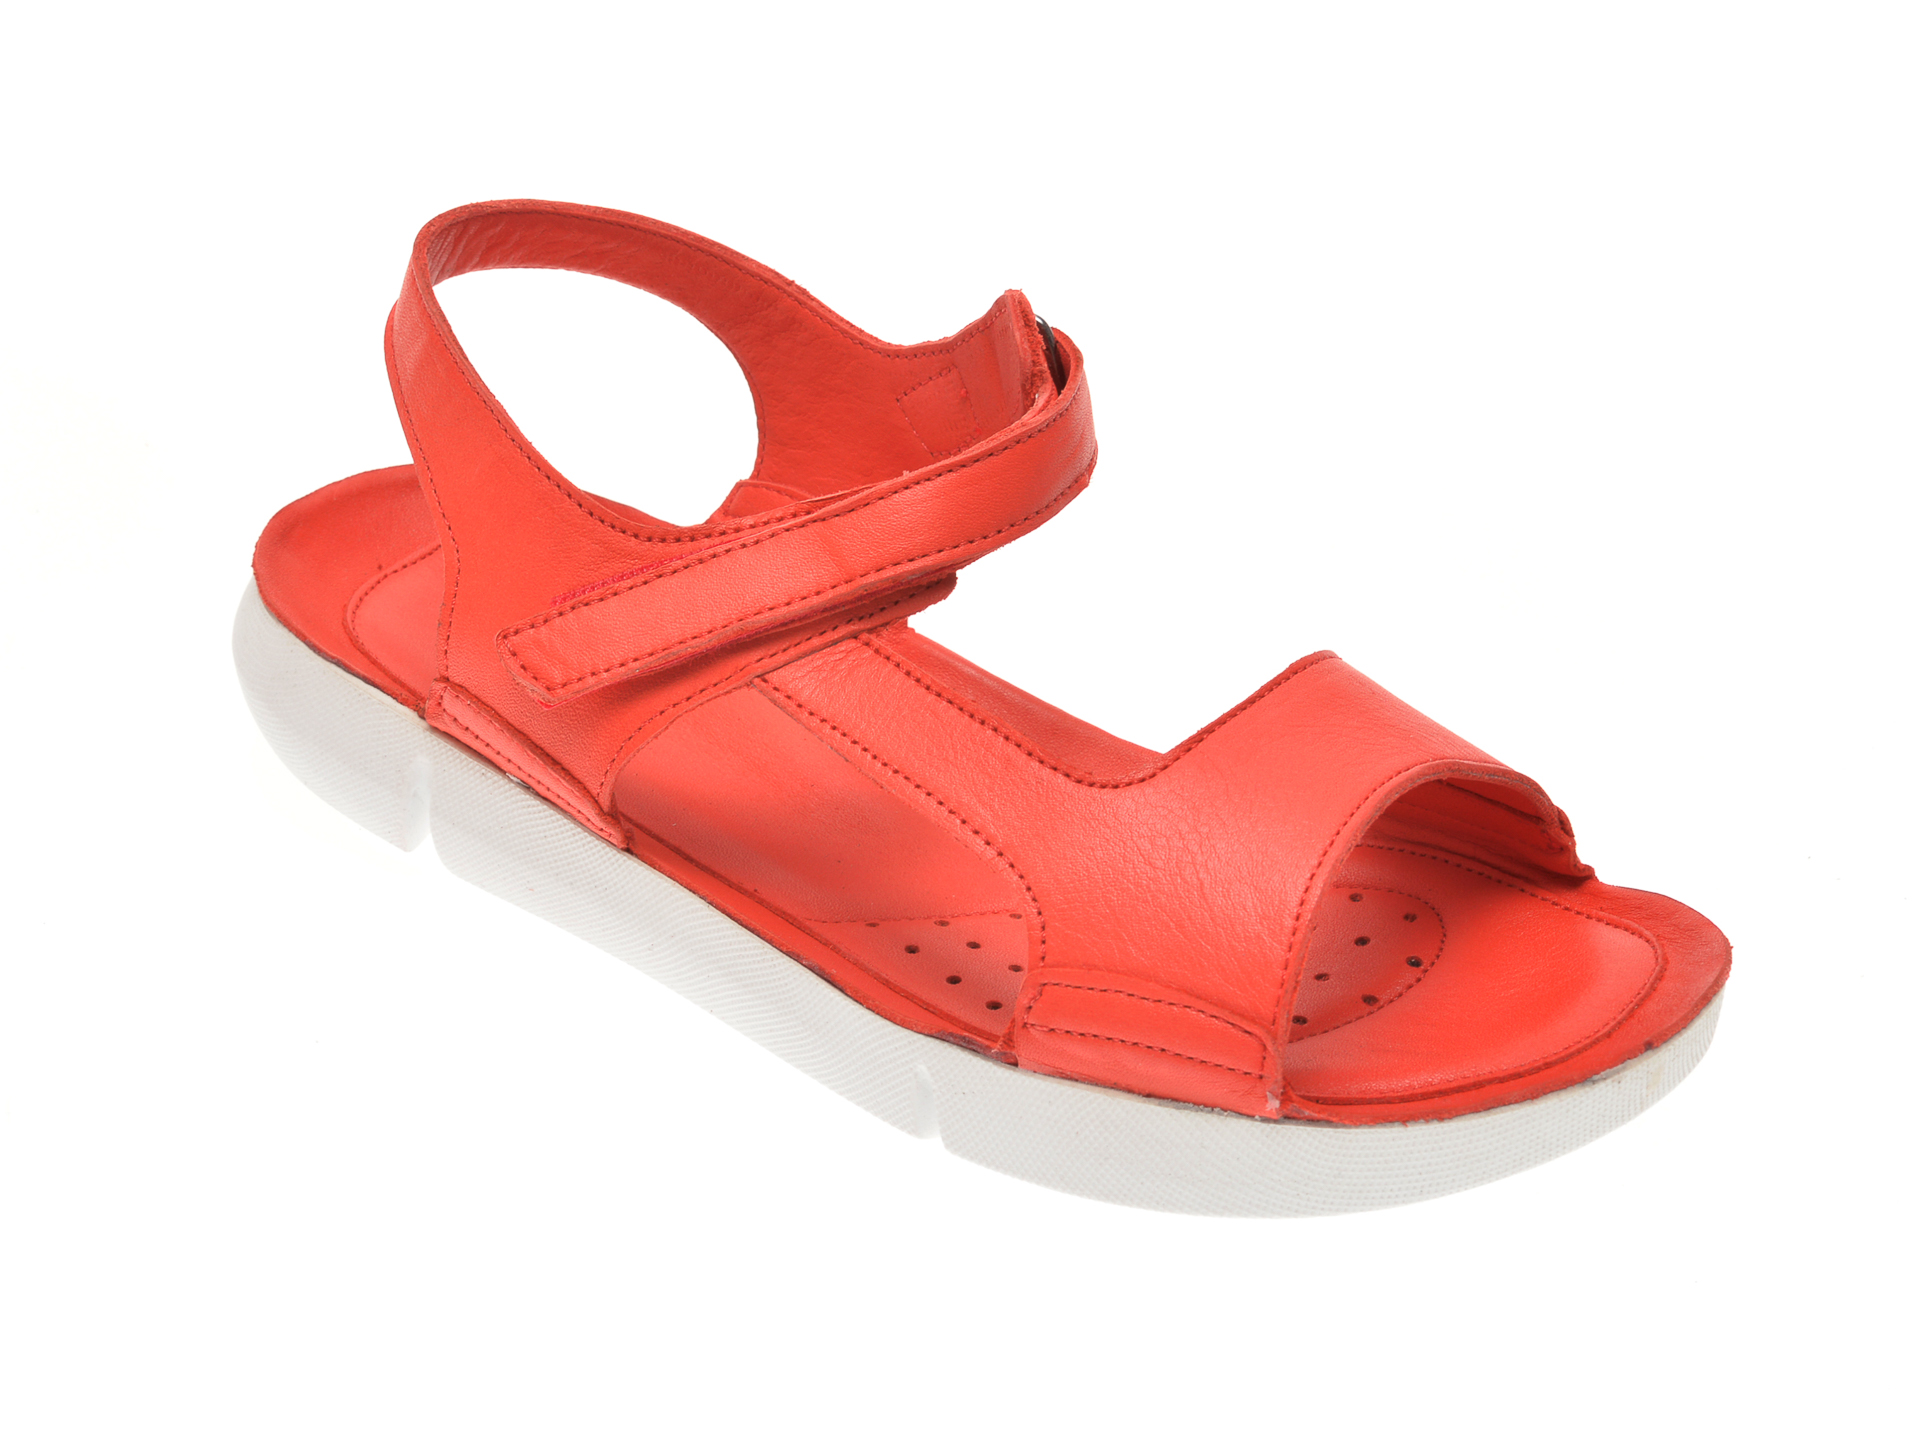 Sandale X TREND rosii, 6001, din piele naturala